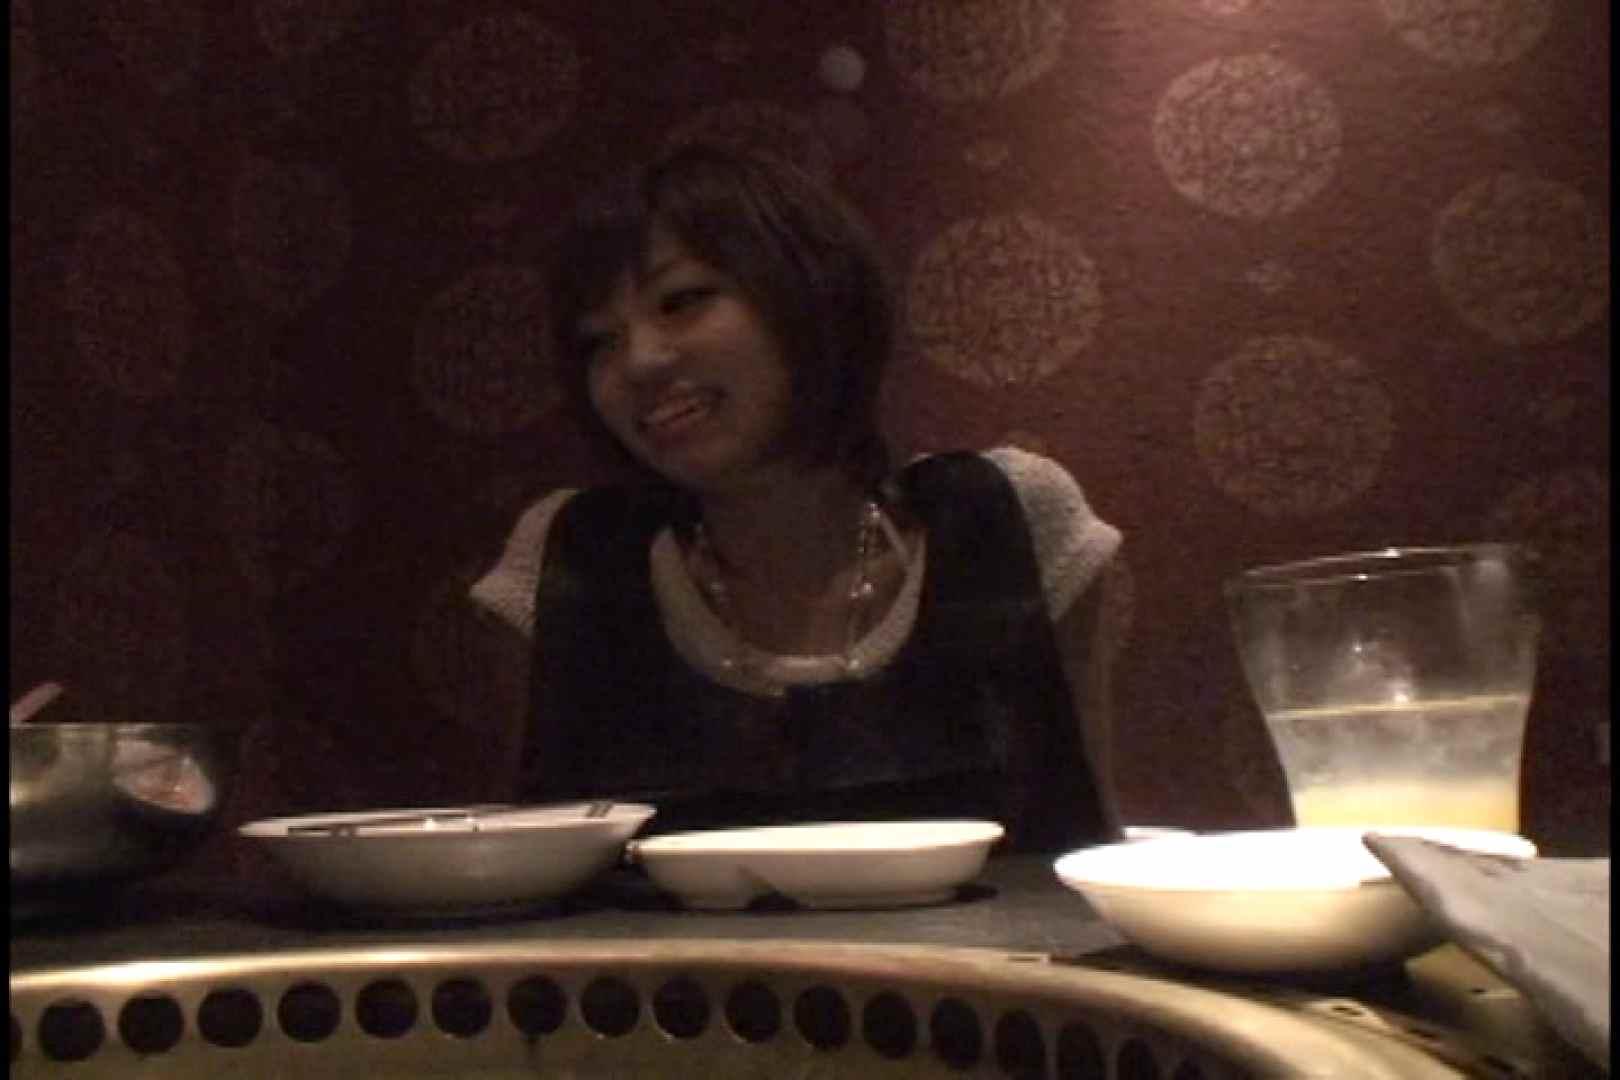 JDハンター全国ツアー vol.026 前編 女子大生のエロ生活  104連発 58